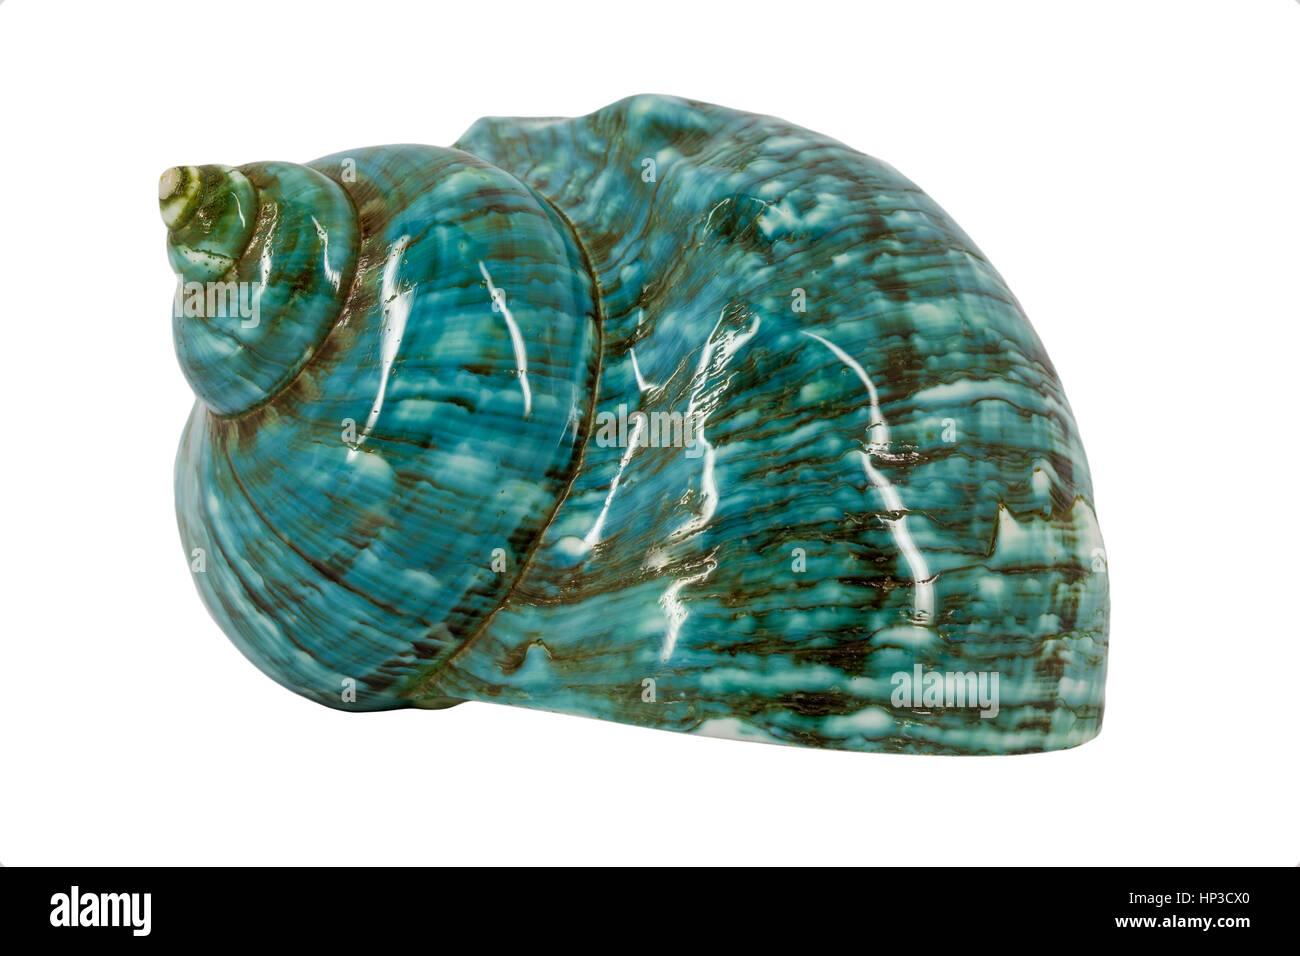 Turquoise seashell Stock Photo